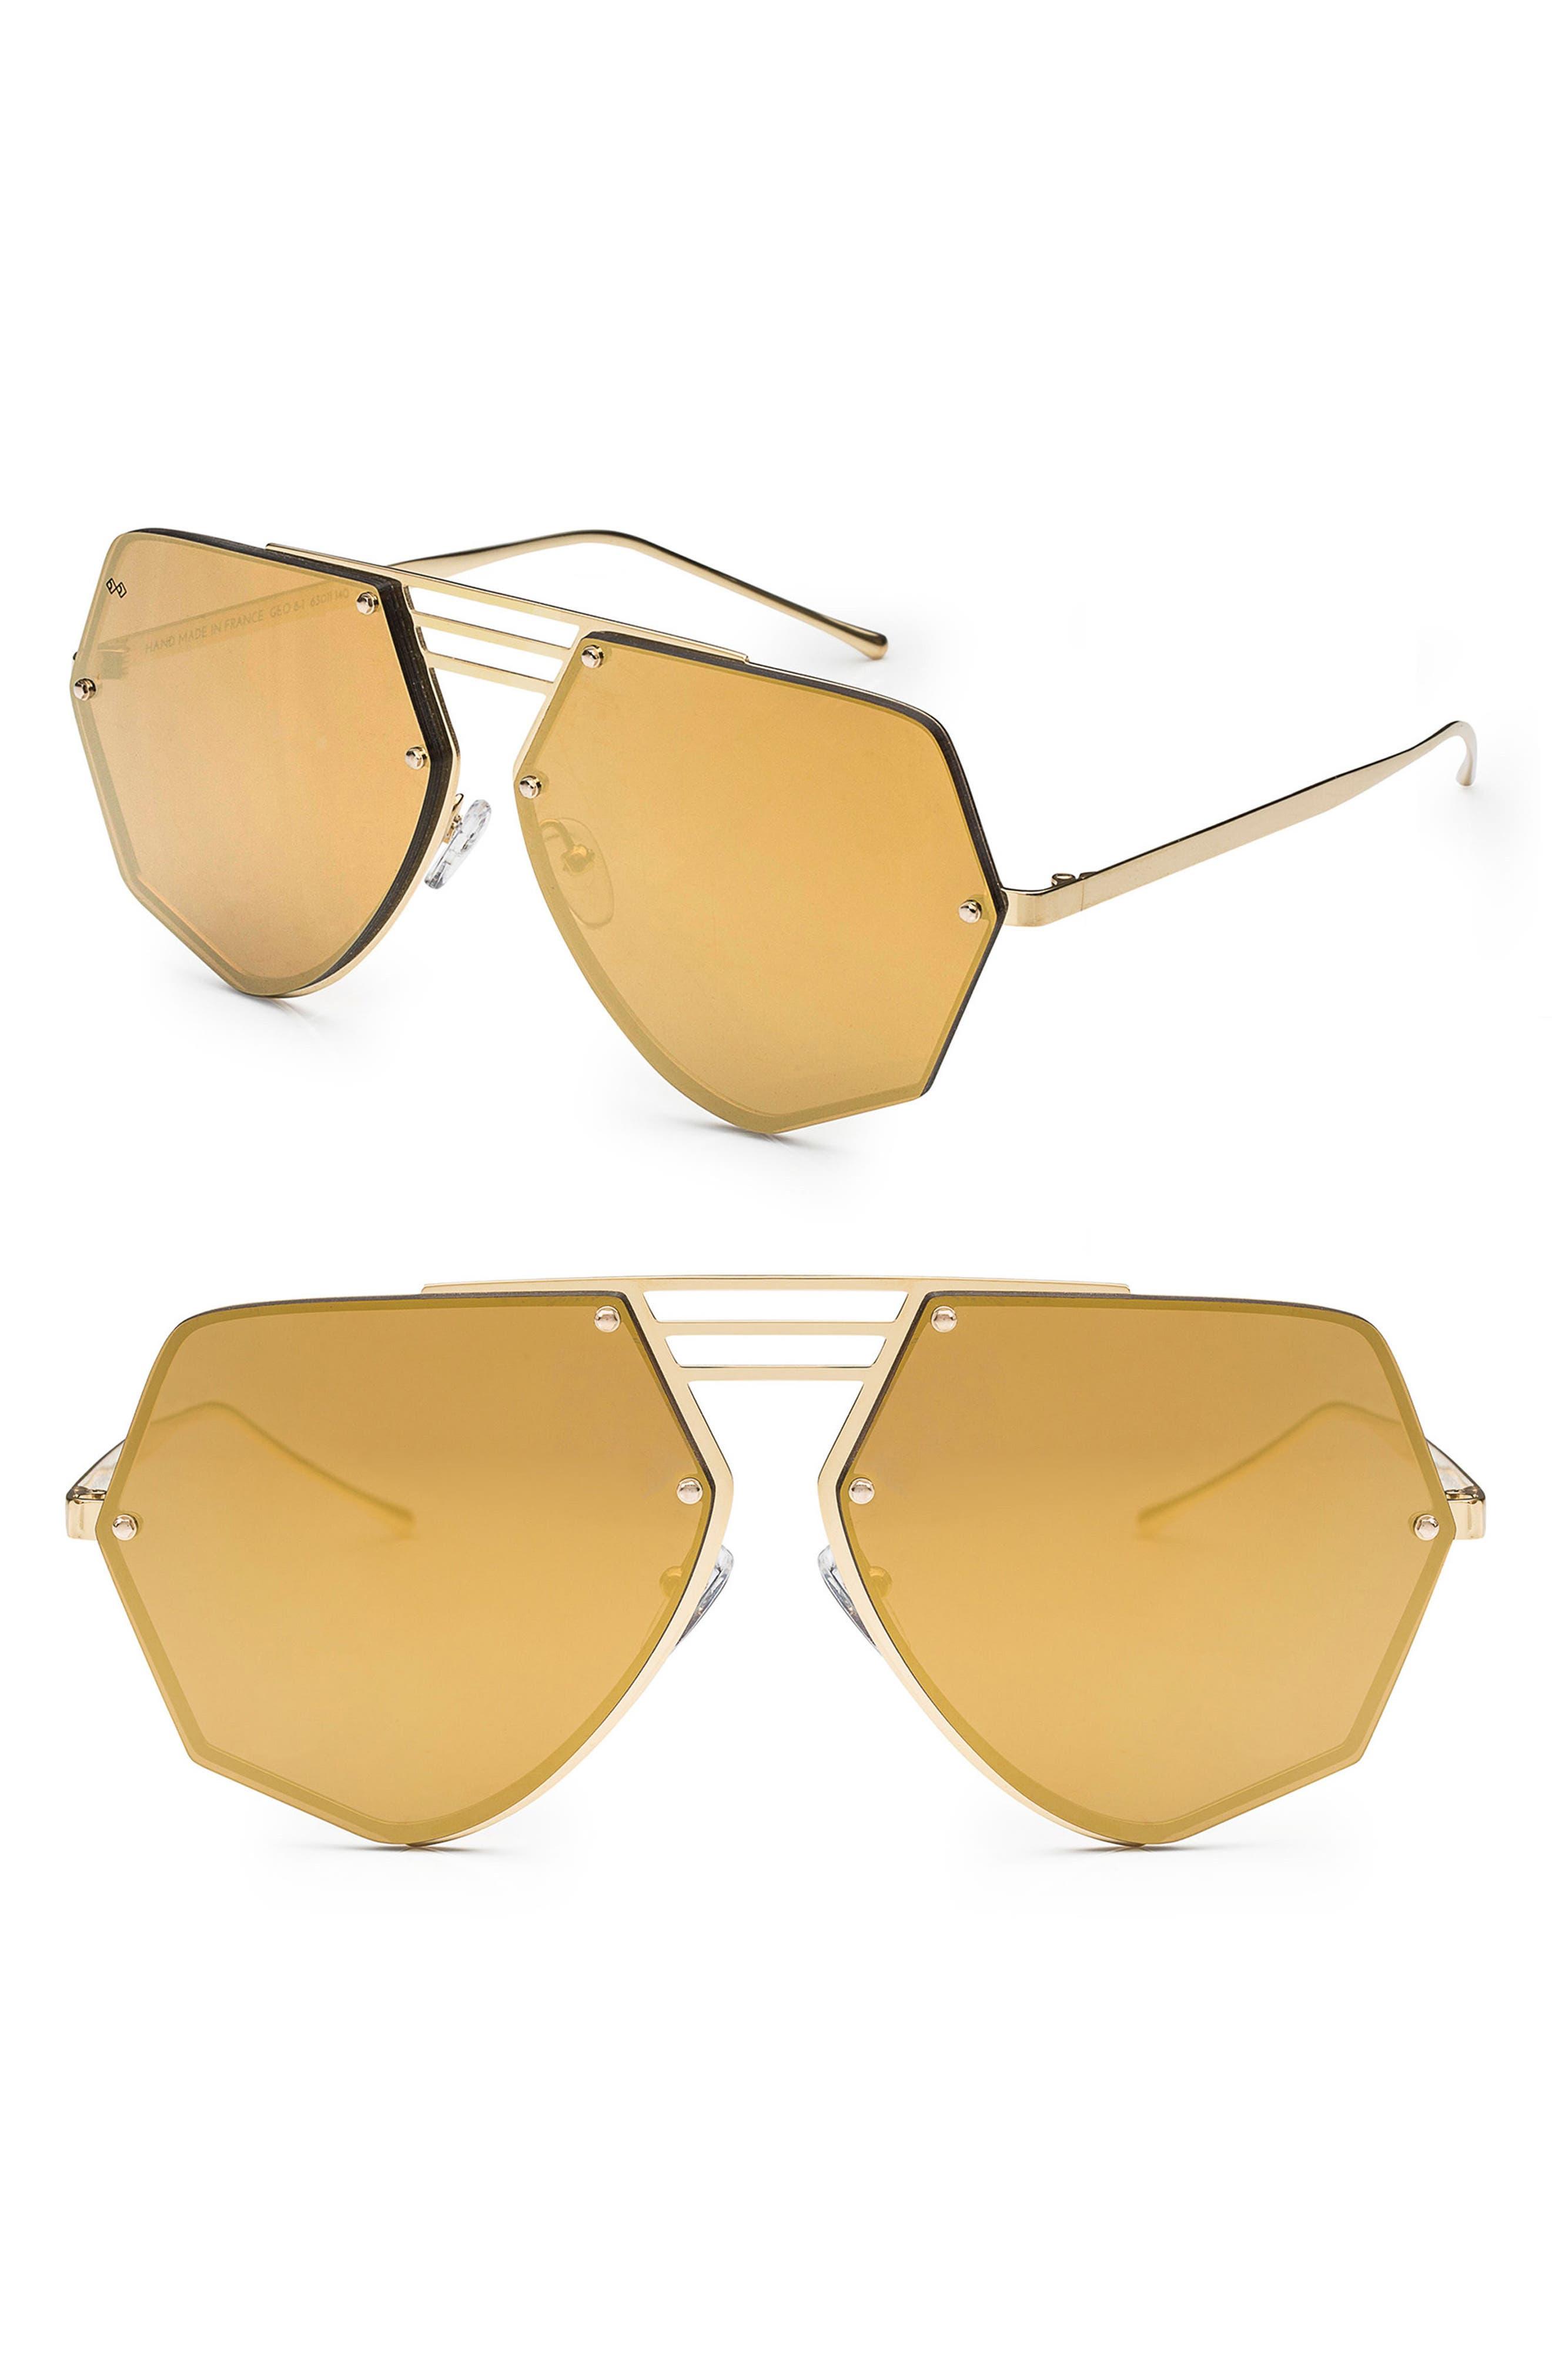 Geo 8 60mm Sunglasses,                         Main,                         color, Gold/ Gold Mirror